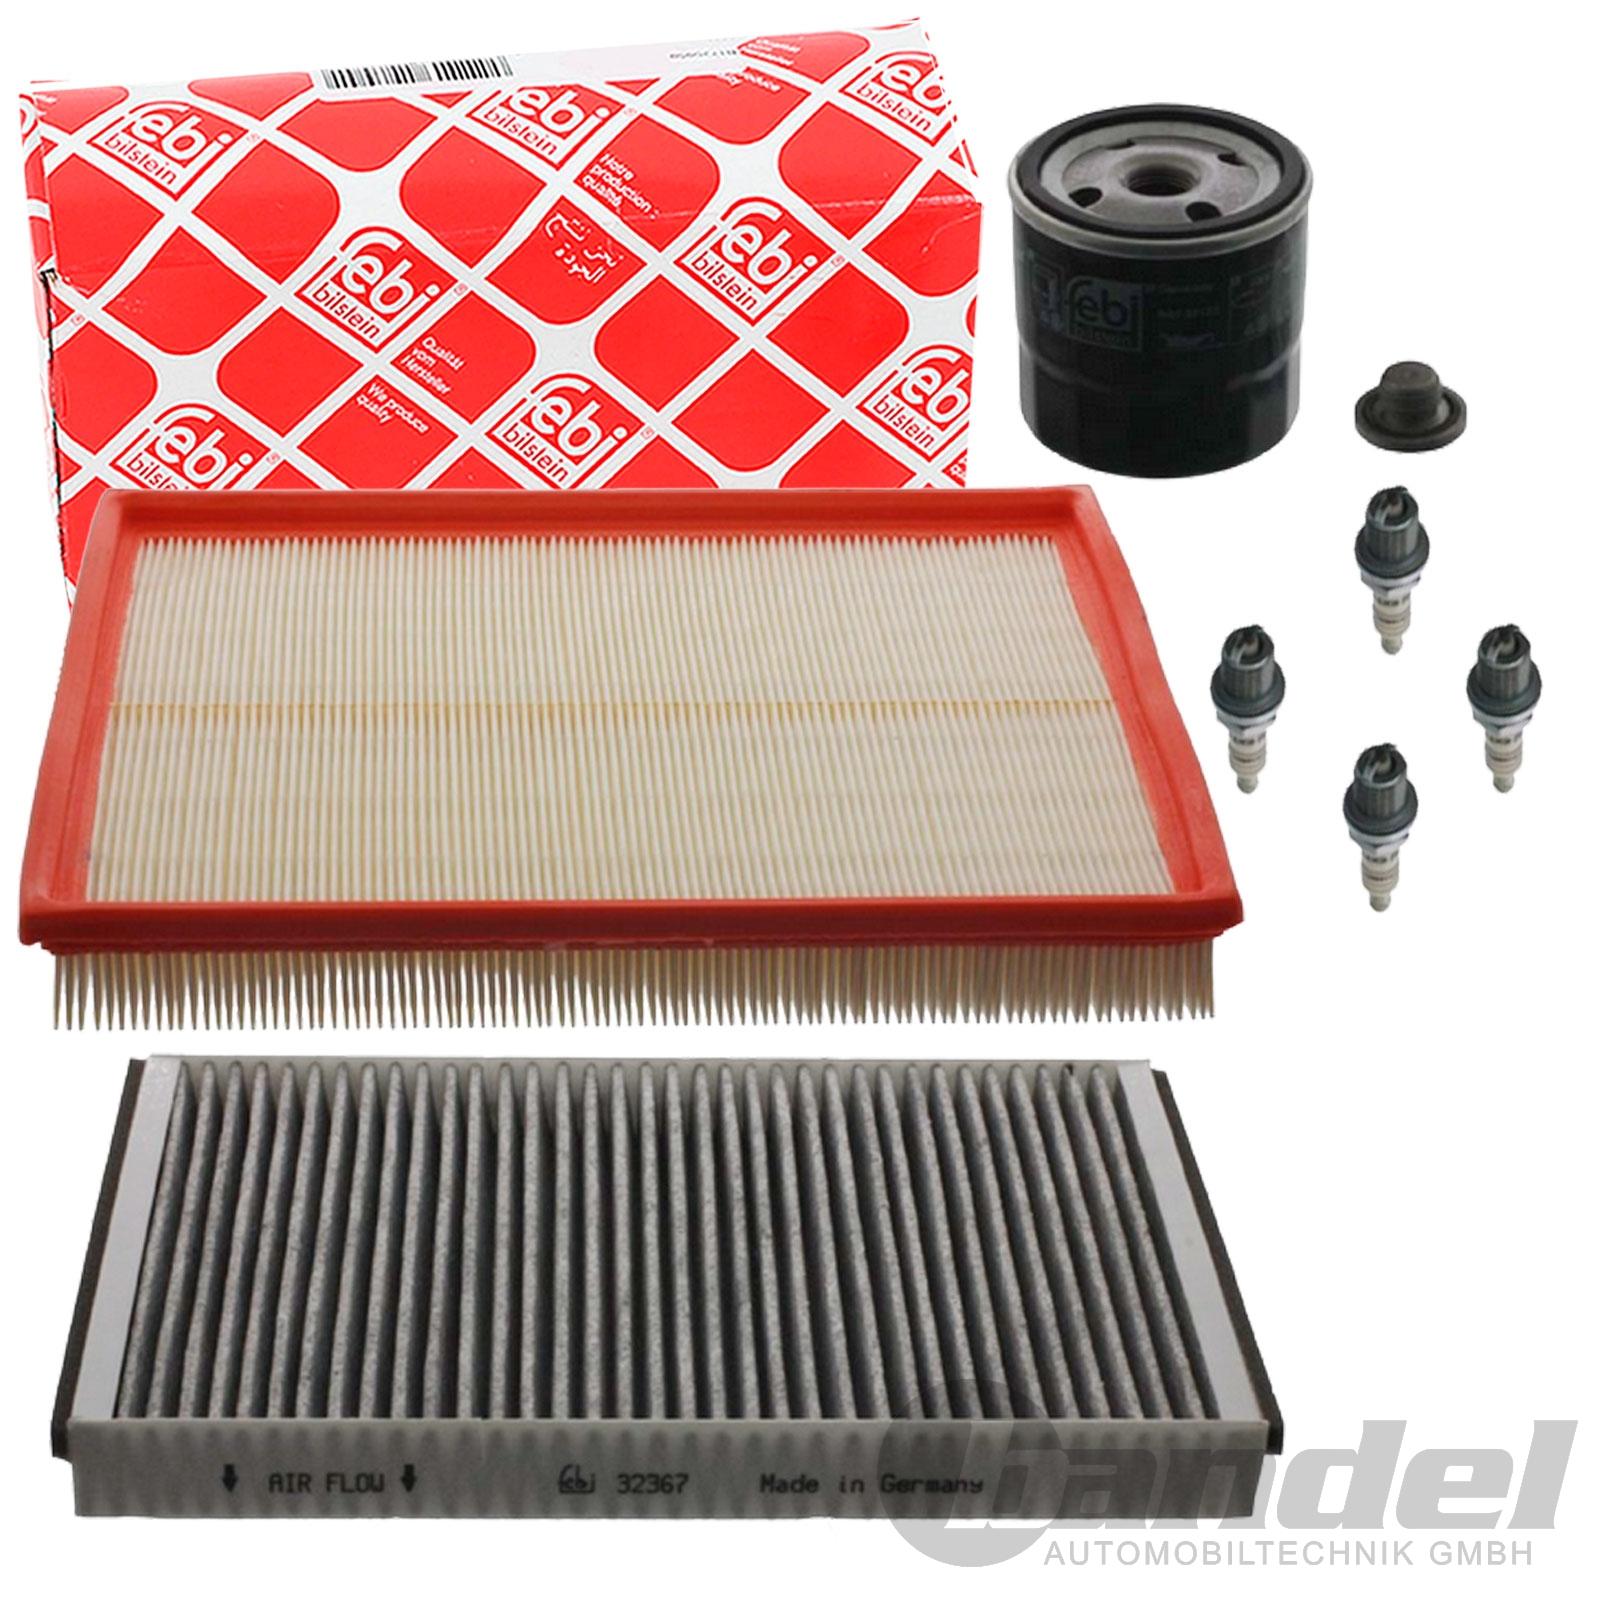 febi inspektionspaket opel astra h 1 6 105ps z ndkerzen l. Black Bedroom Furniture Sets. Home Design Ideas